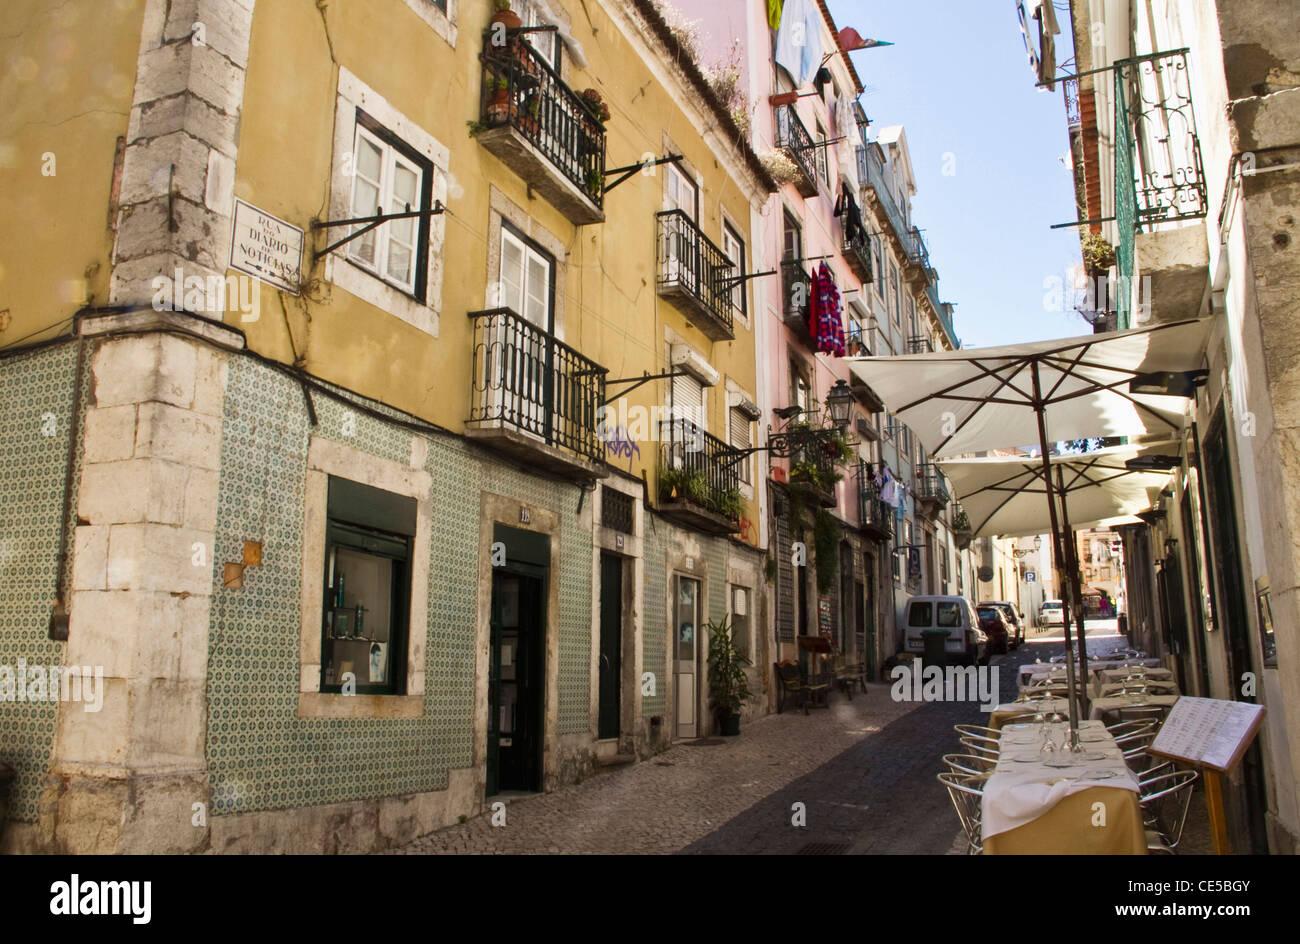 Portugal, Lisbon. Street in the Bairro Alto neighborhood. - Stock Image